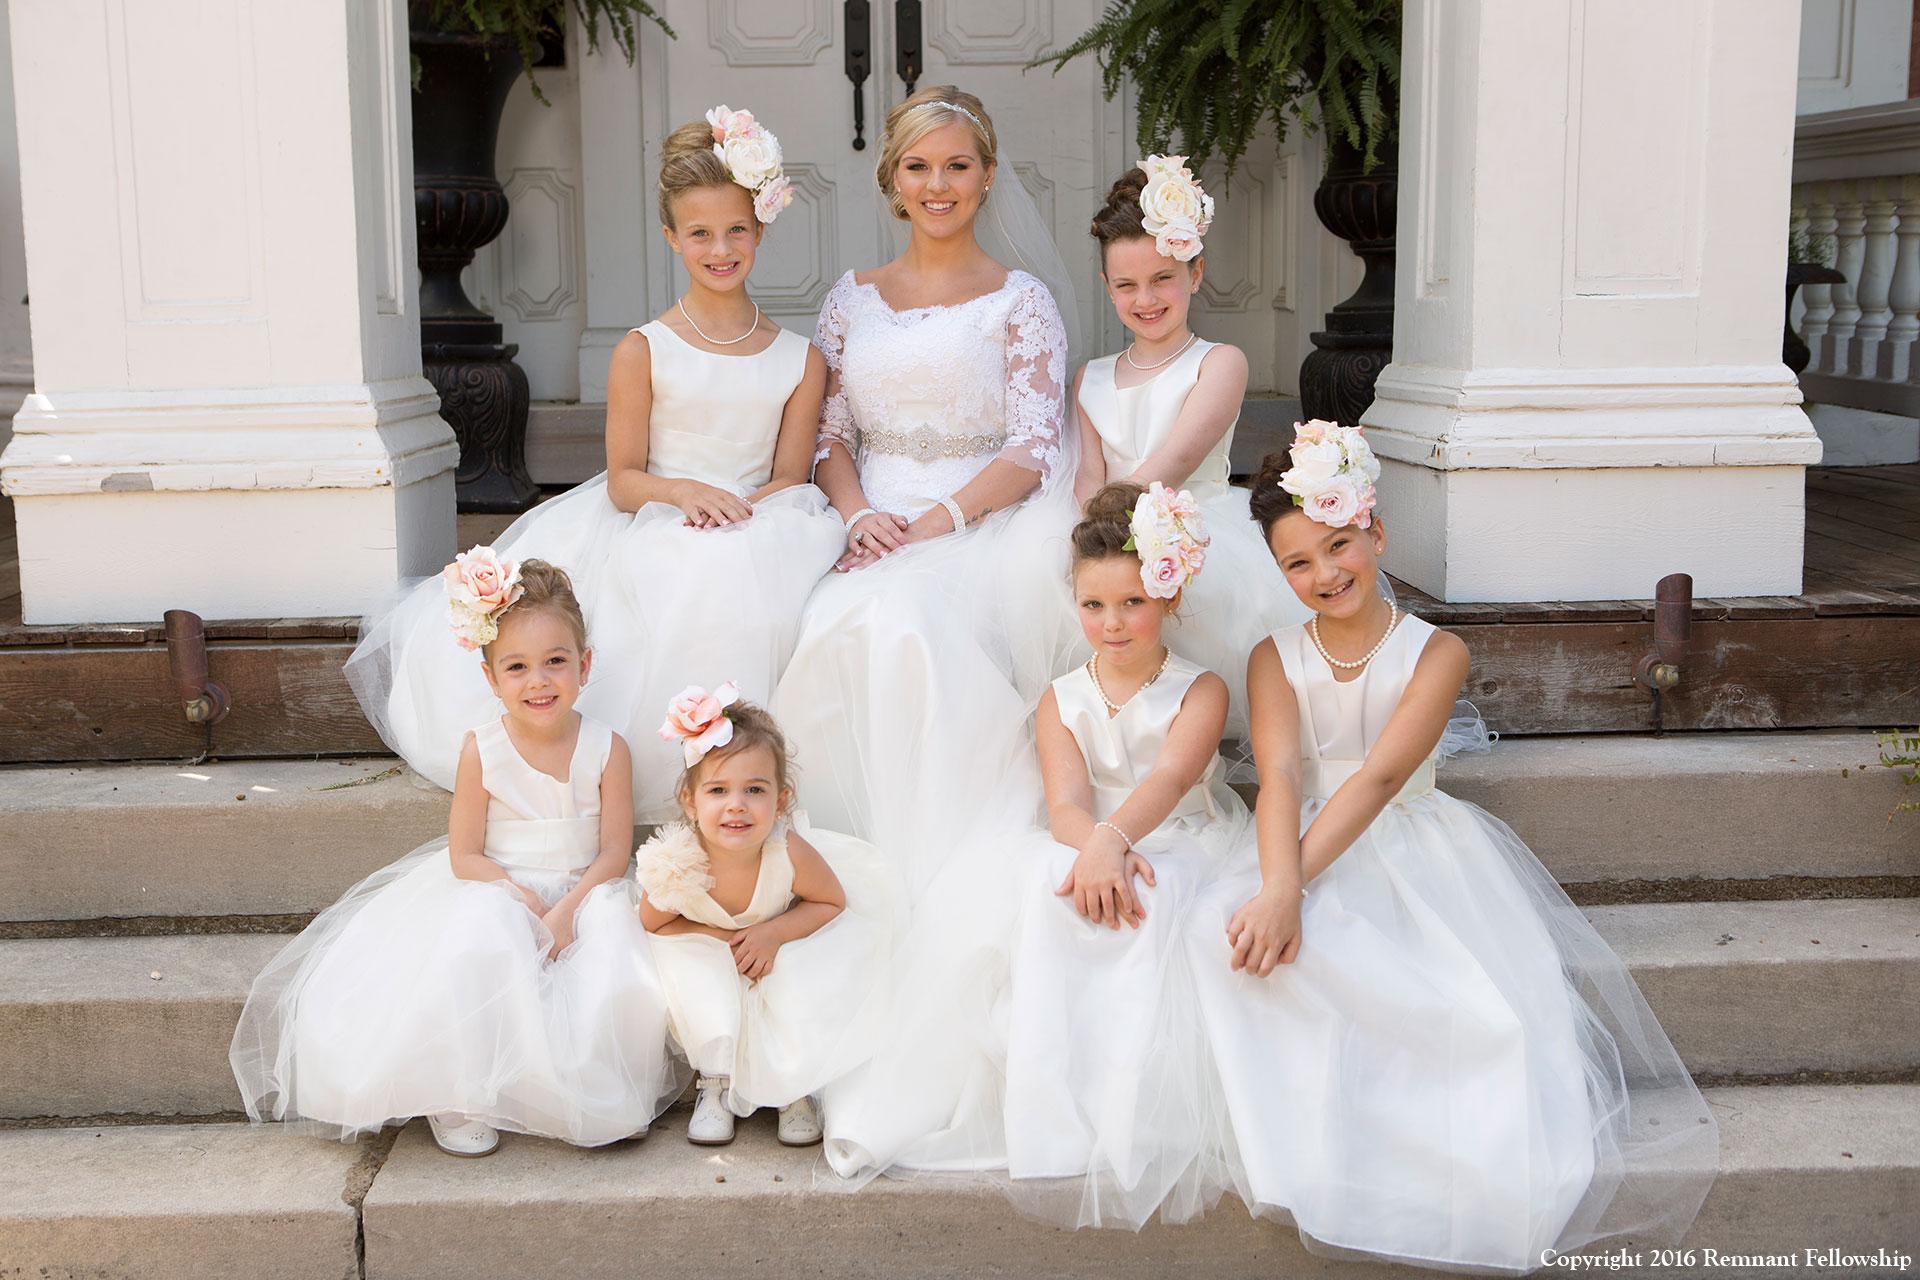 Remnant-Fellowship-Wedding-Peters-Sroda-Bride-Flowergirls